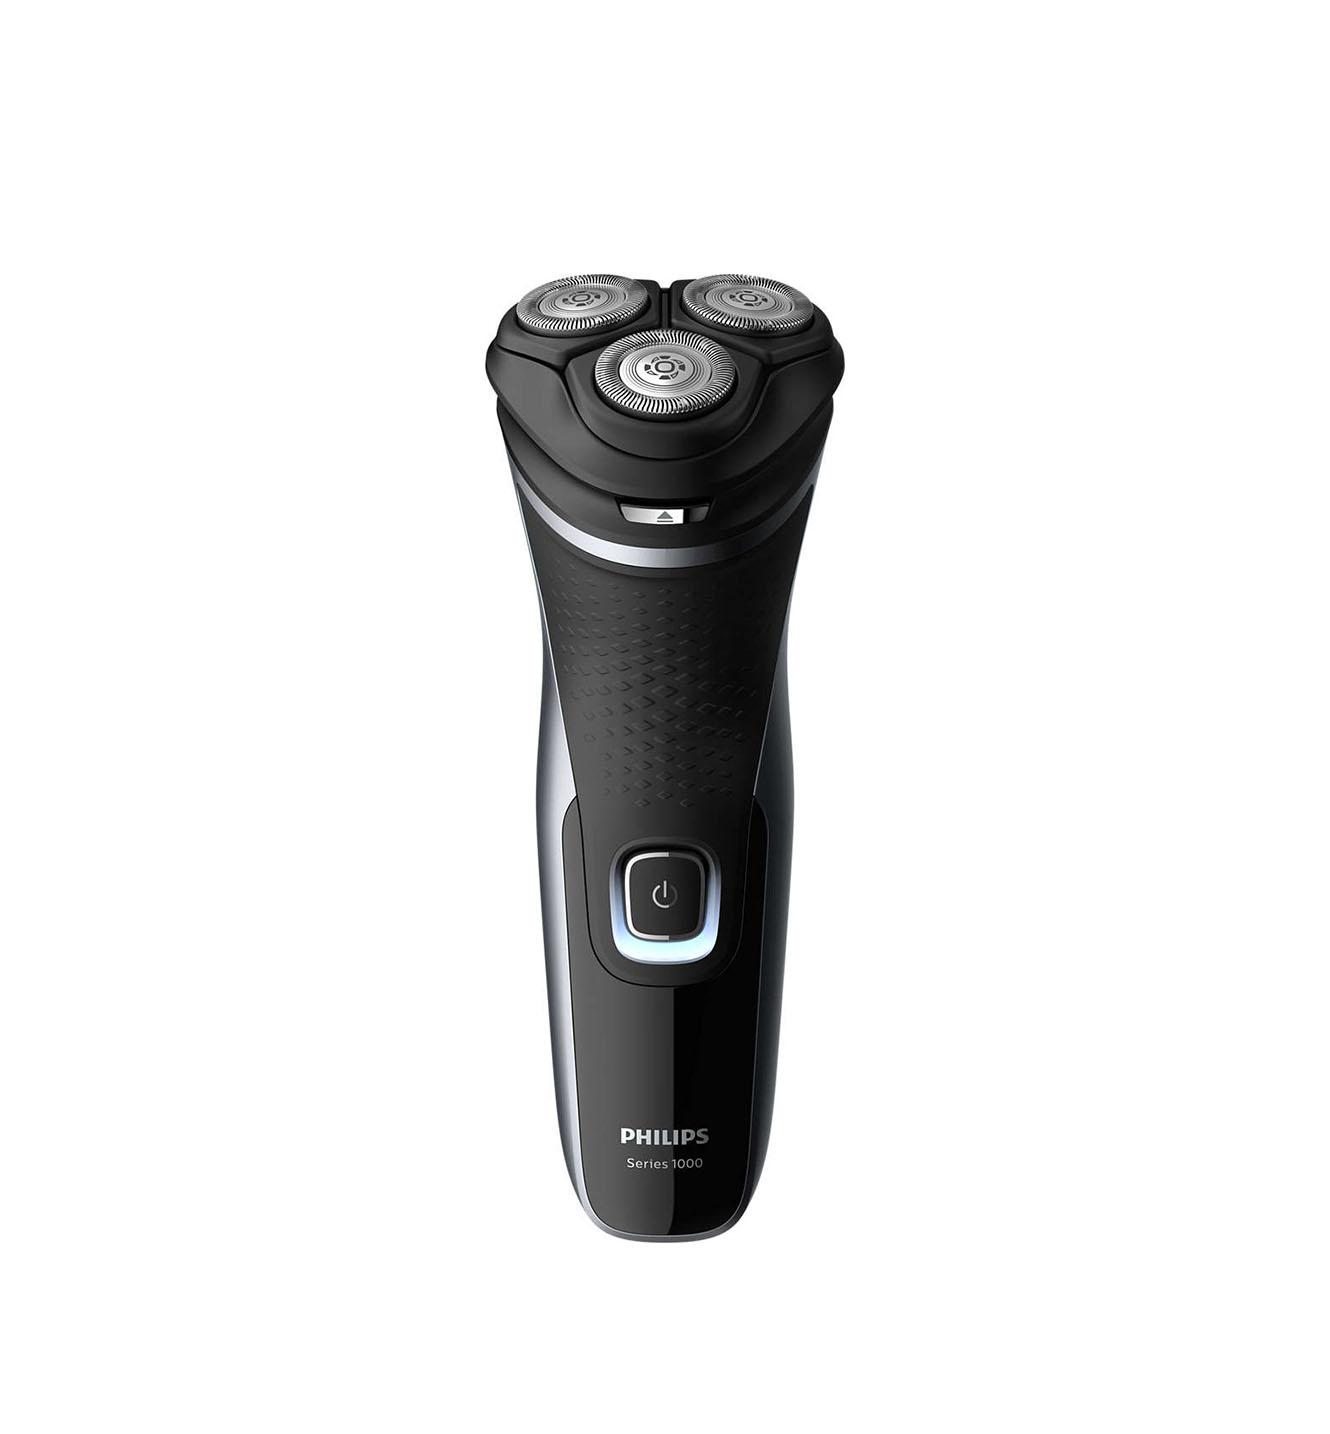 Philips Shaver 1000 S1231/41 Ξυριστική Μηχανή